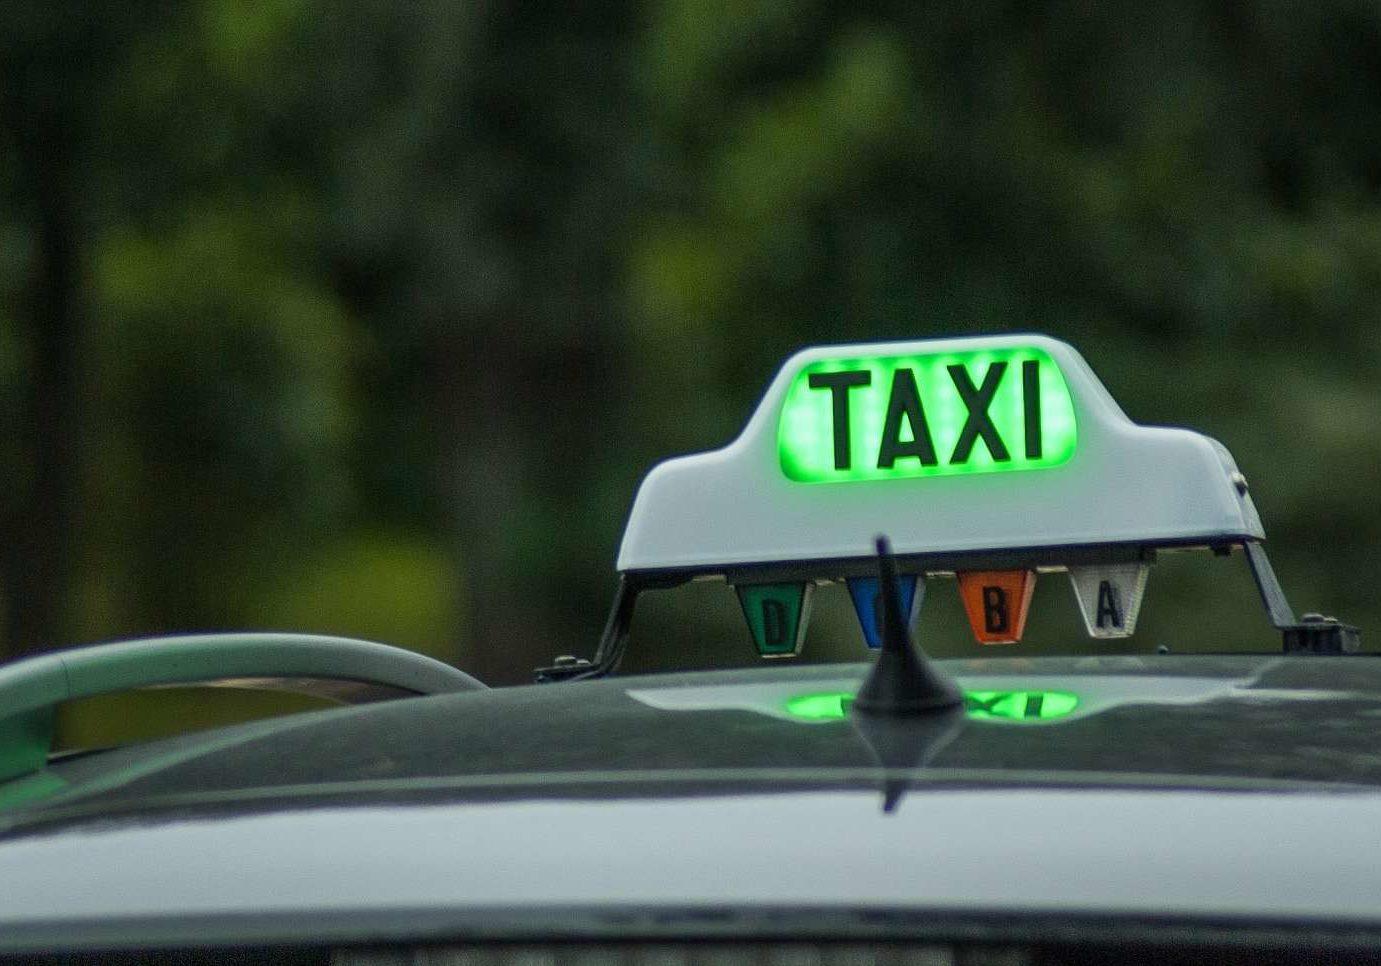 Chauffeur taxi à Lyon